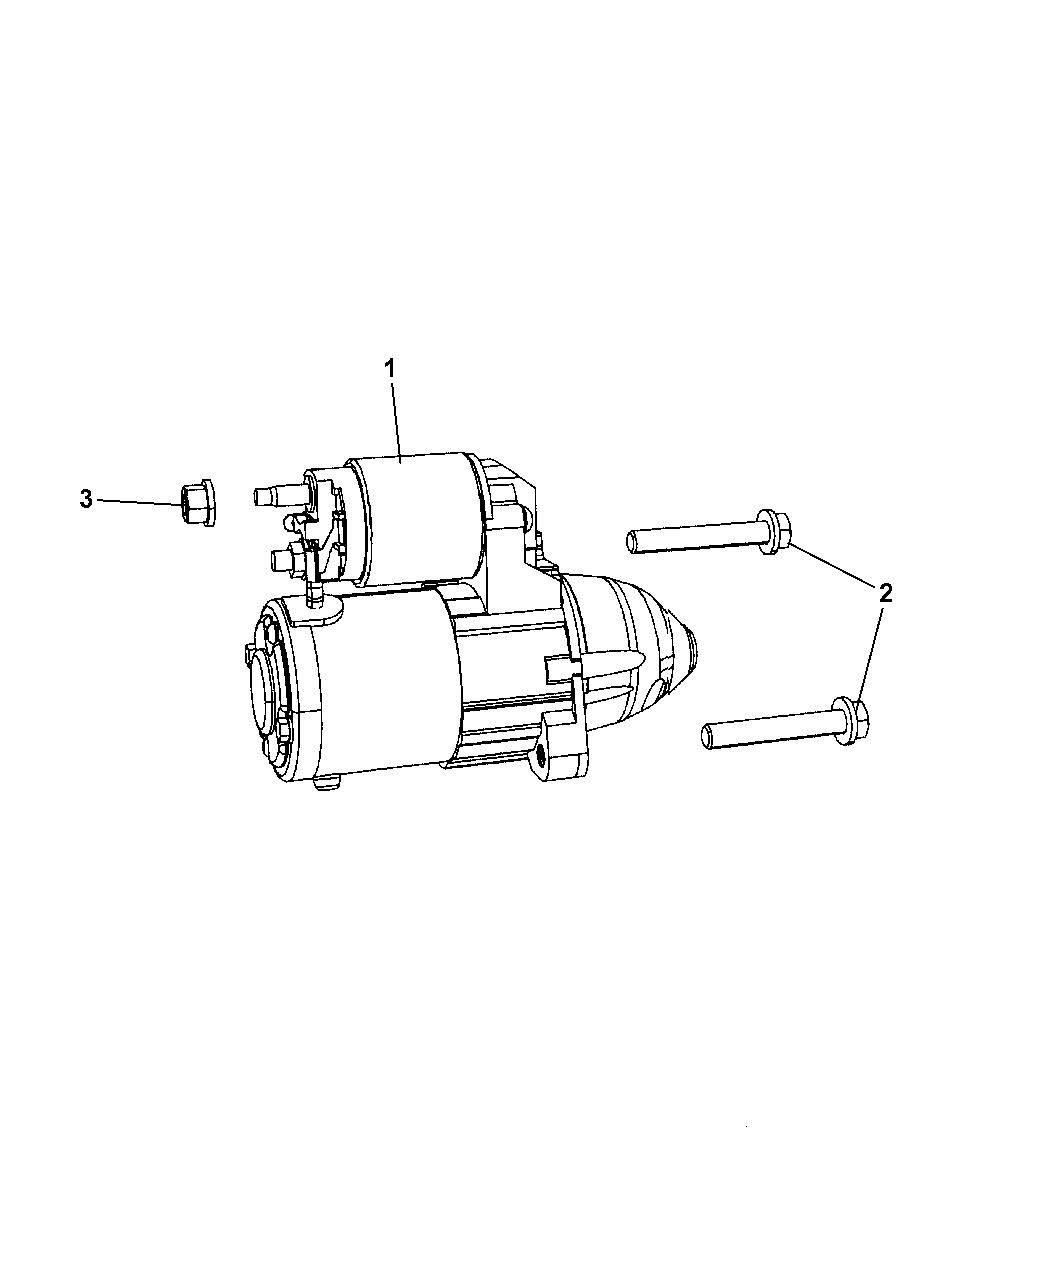 WRG-5461] 2014 Jeep Patriot Engine Diagram